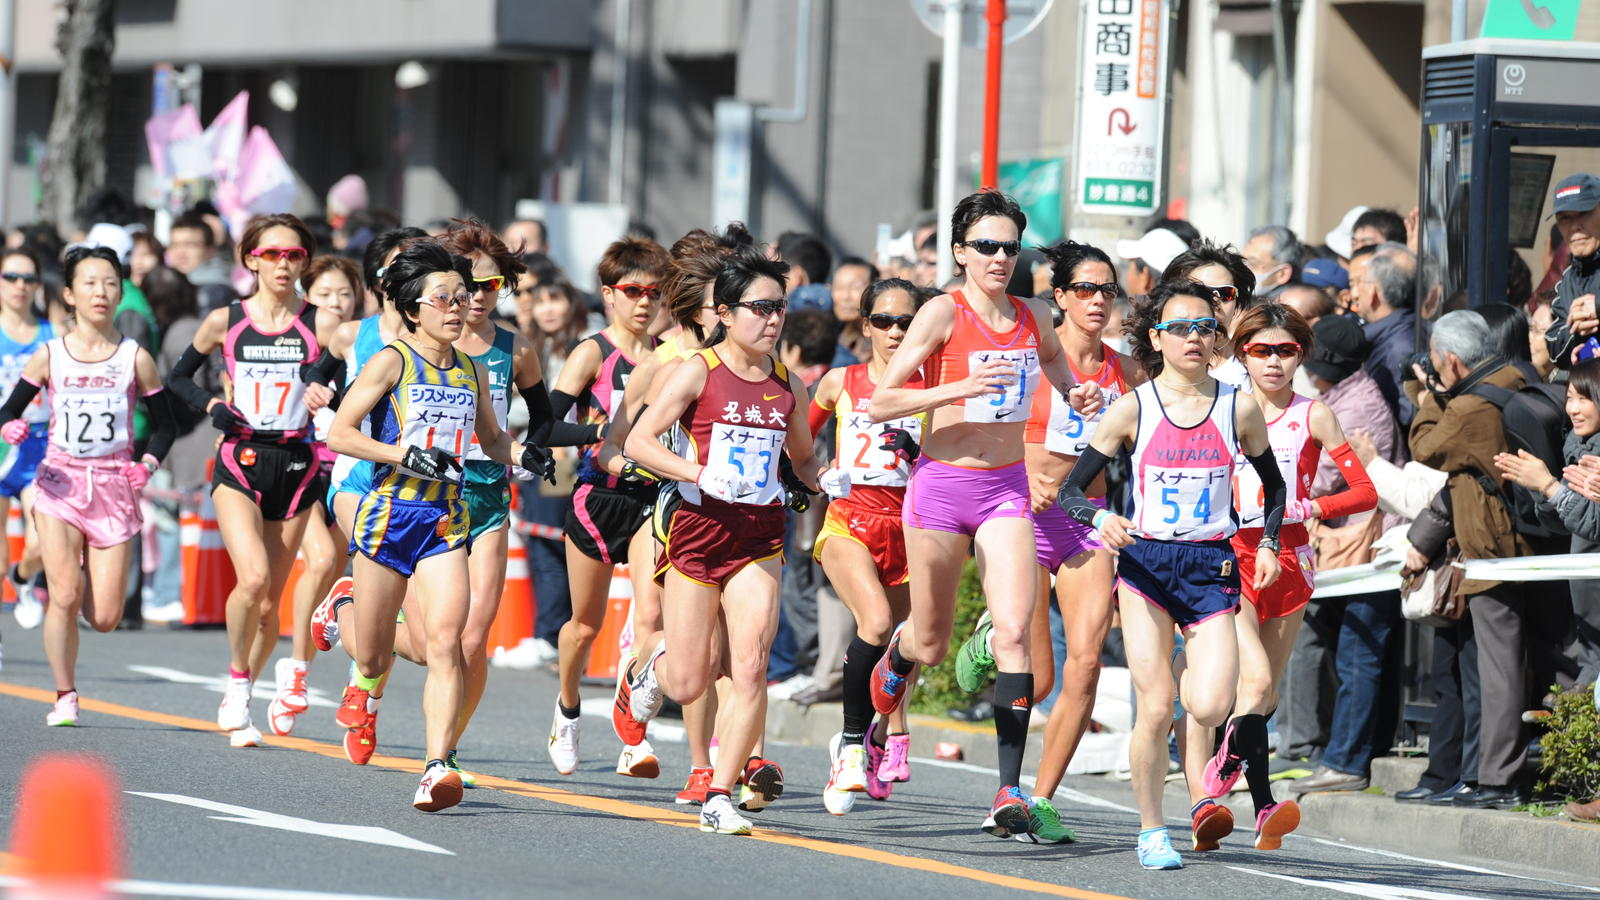 Nagoya Women's Marathon 2012 biggest of its kind with